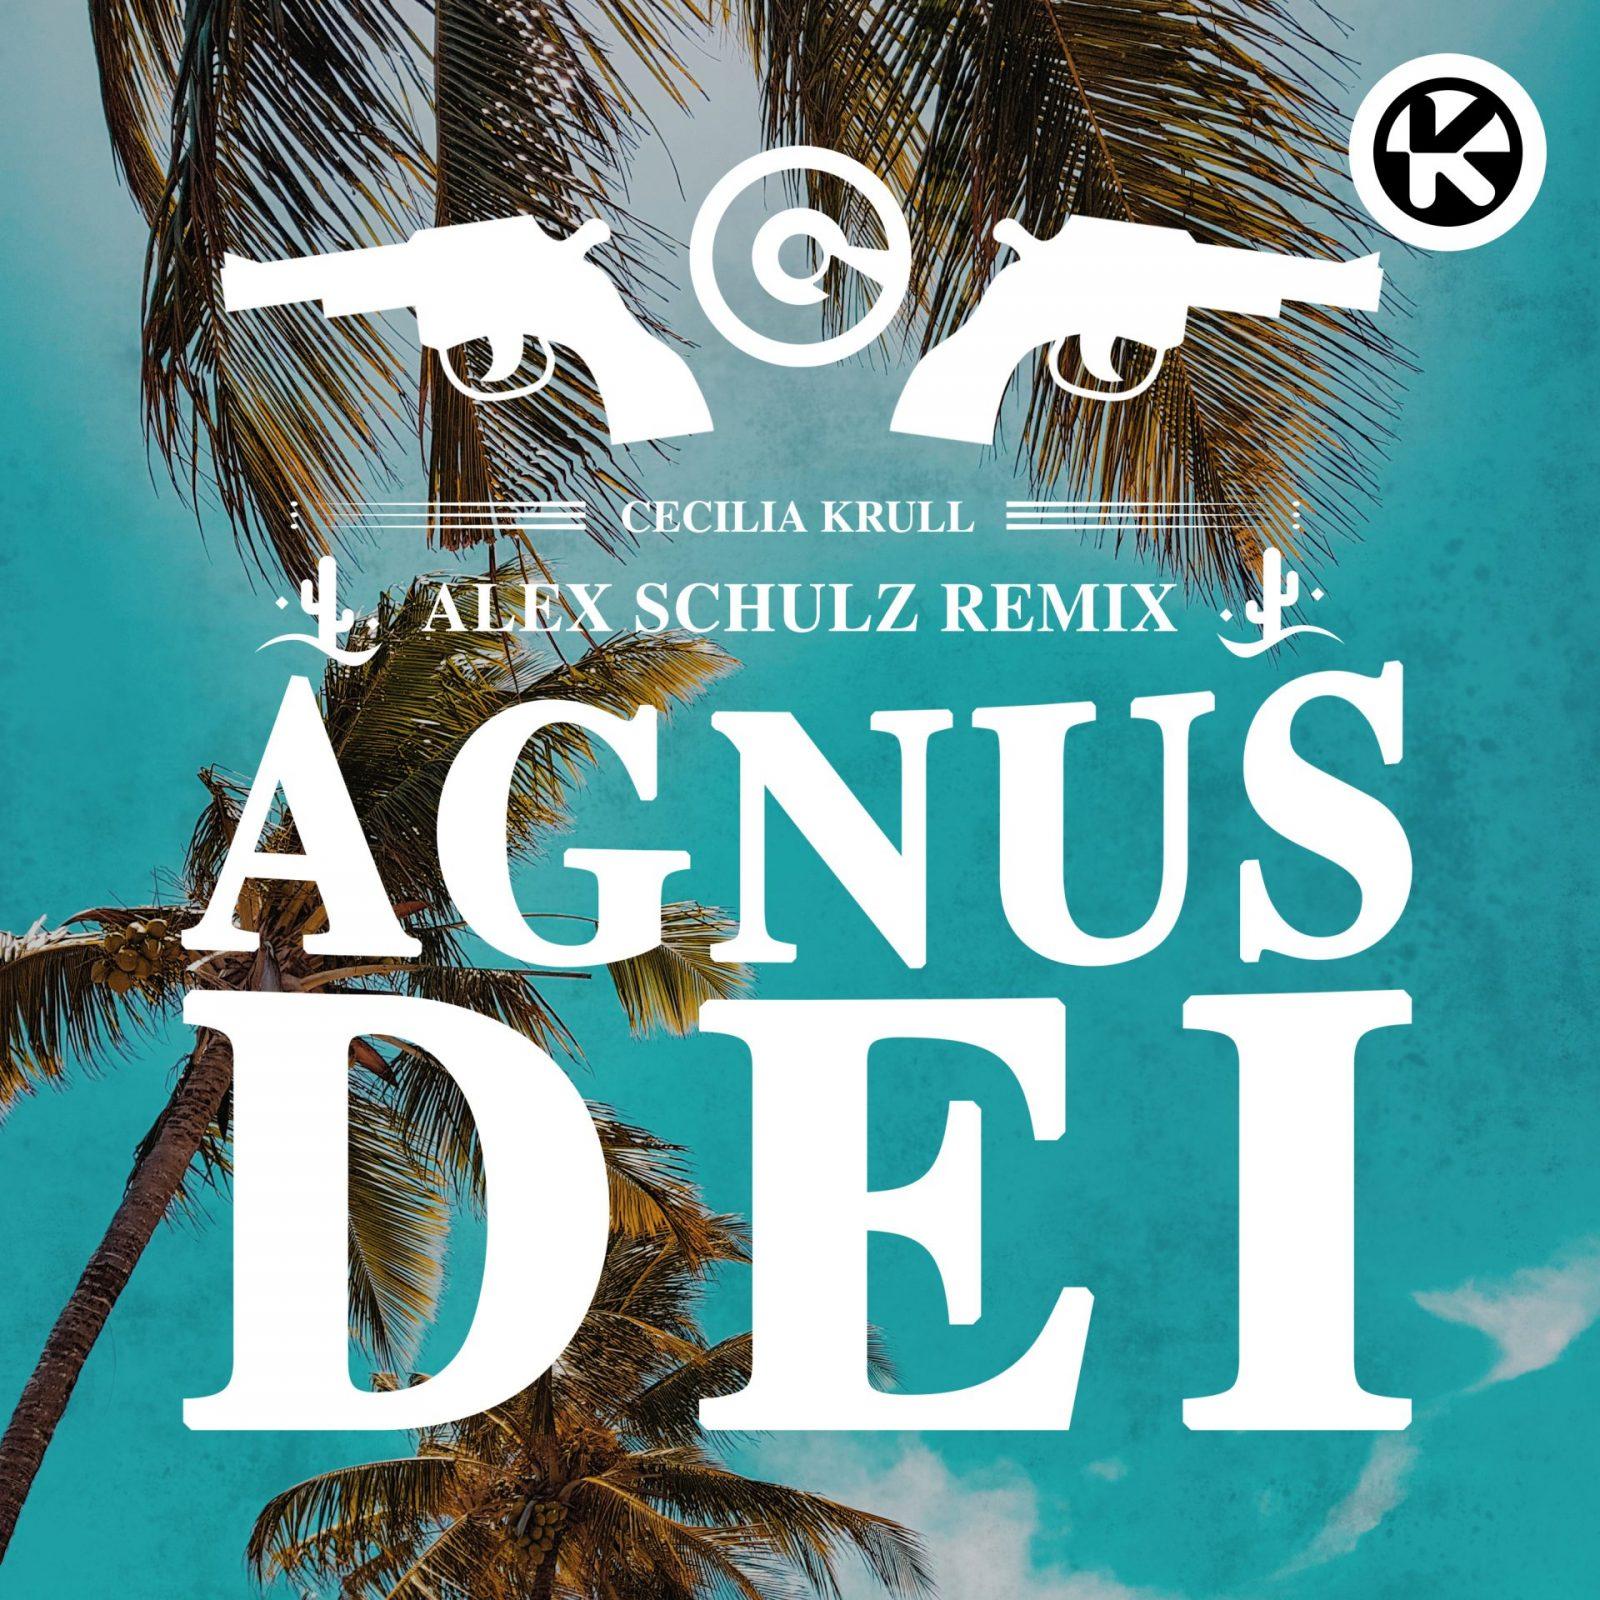 "CECILIA KRULL ""Agnus Dei (Alex Schulz Remix)"""